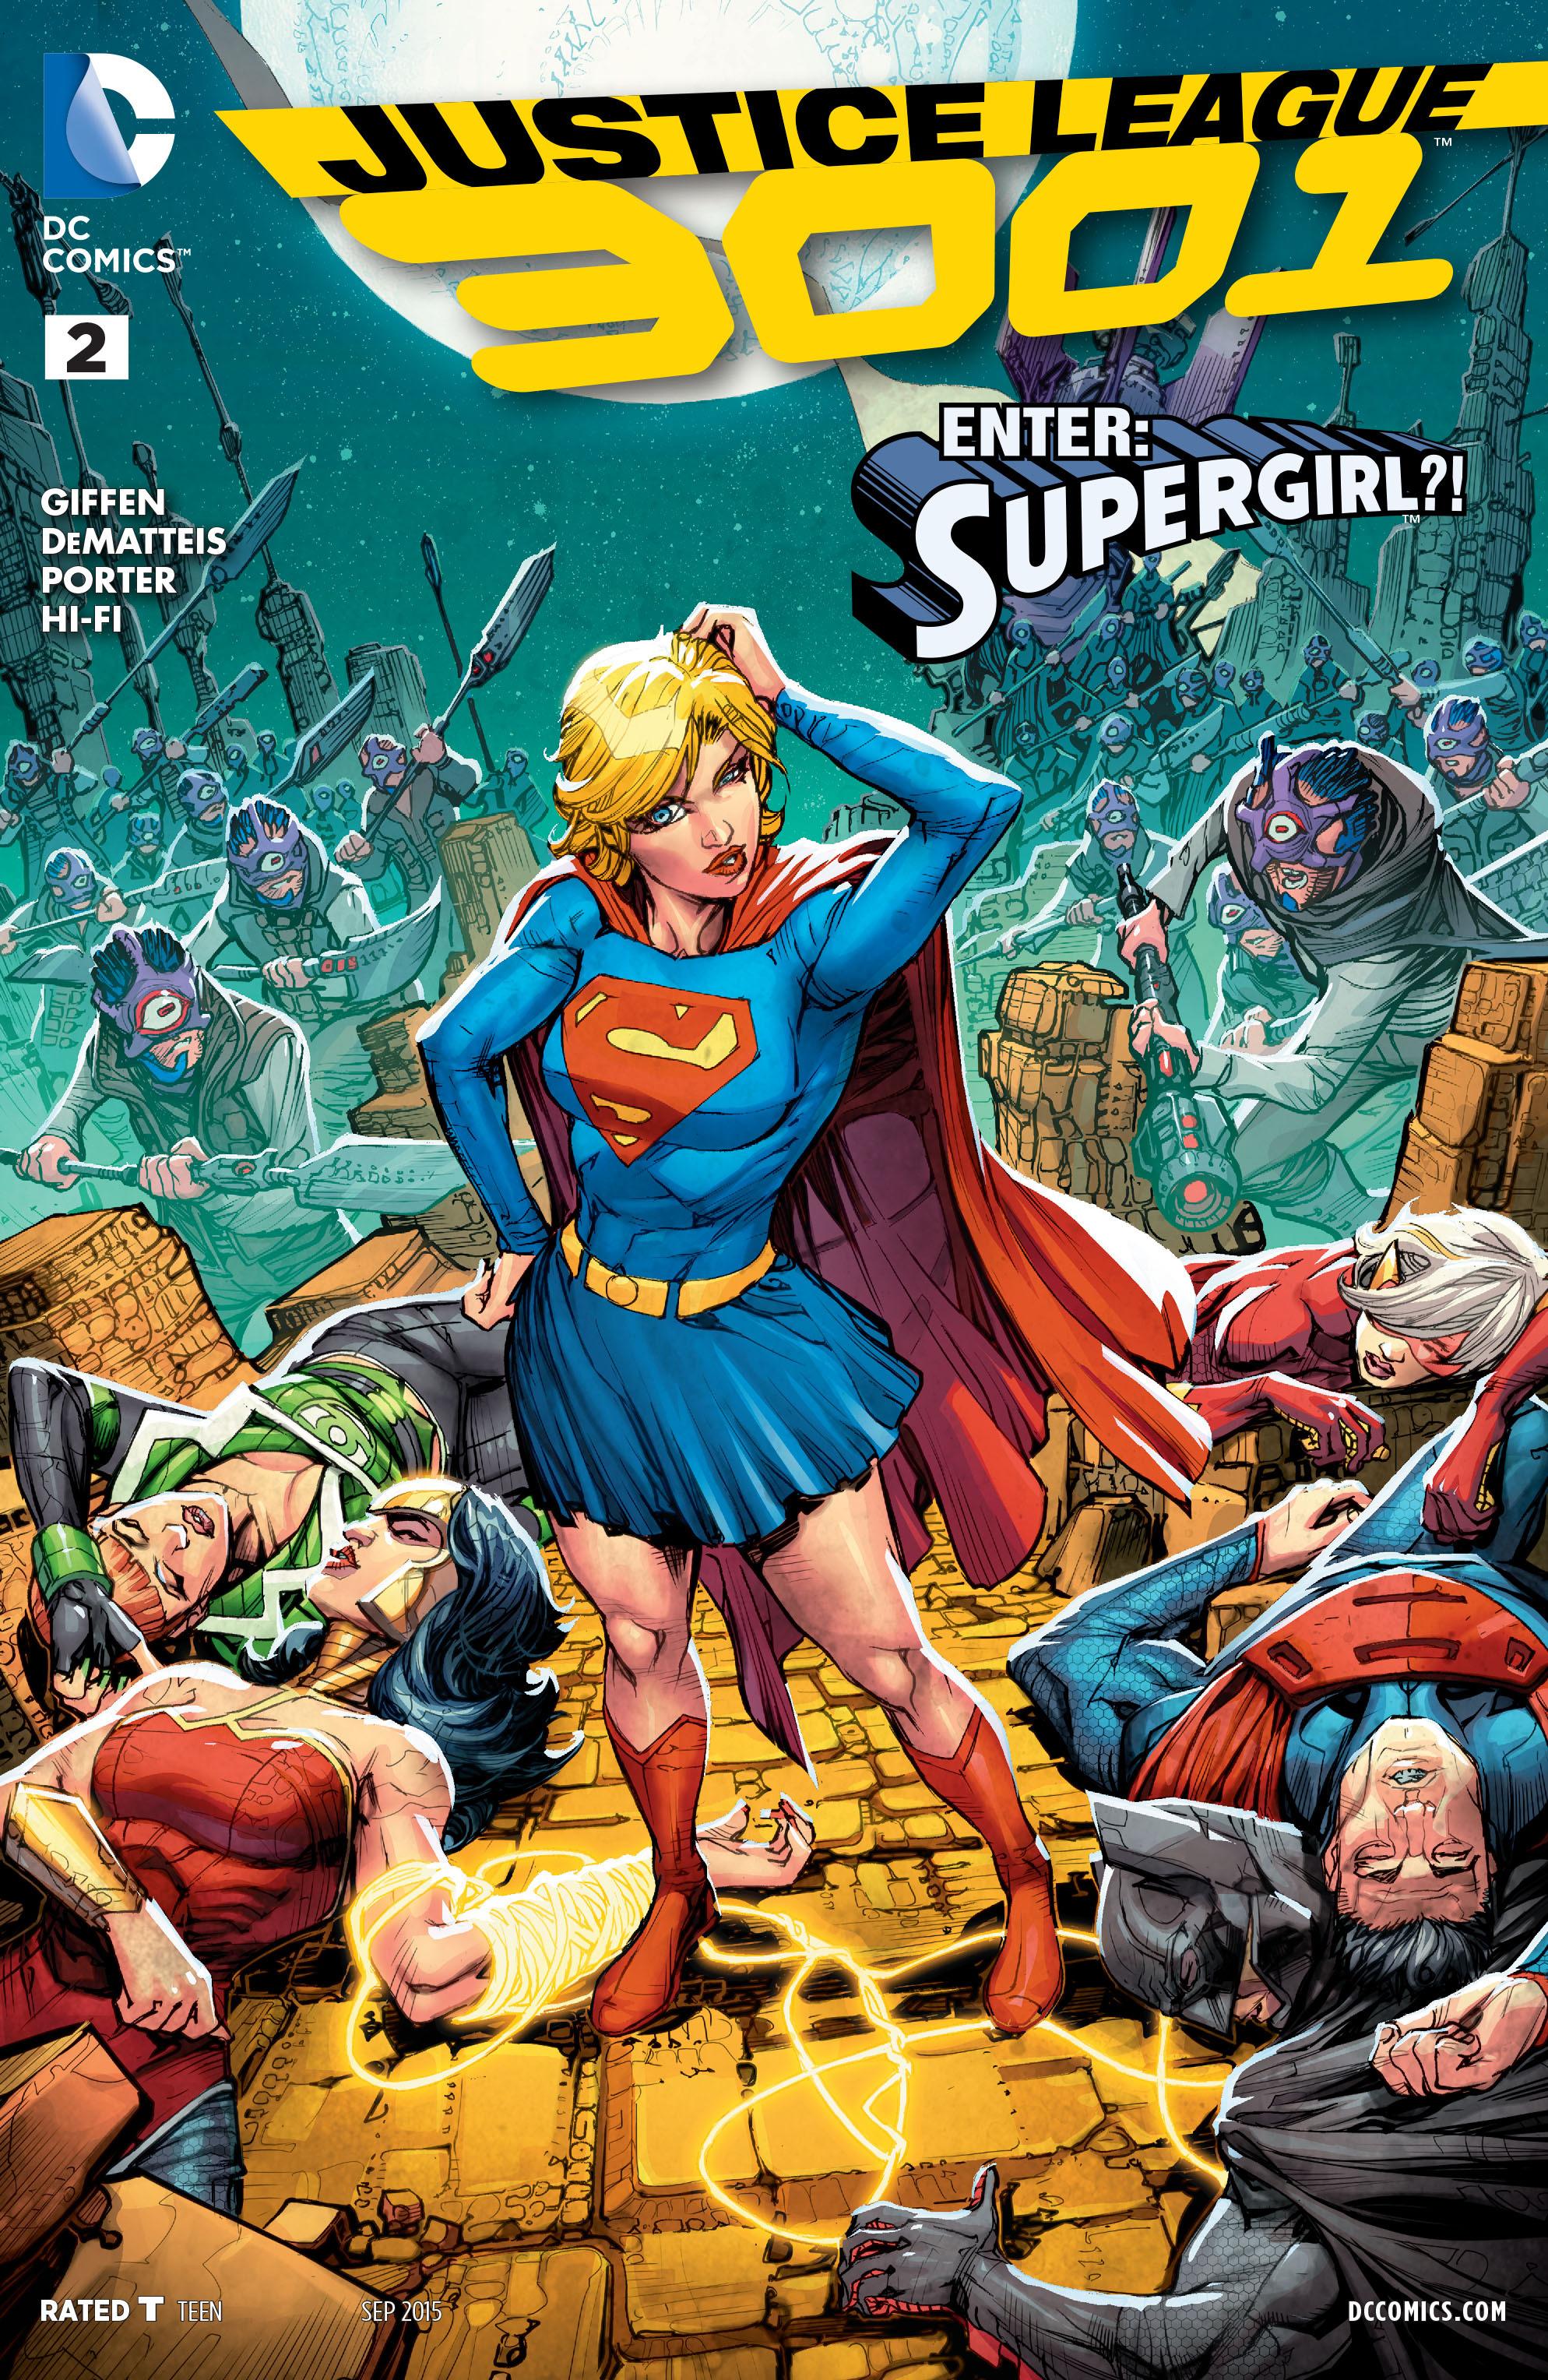 Justice League 3001 2 Page 1